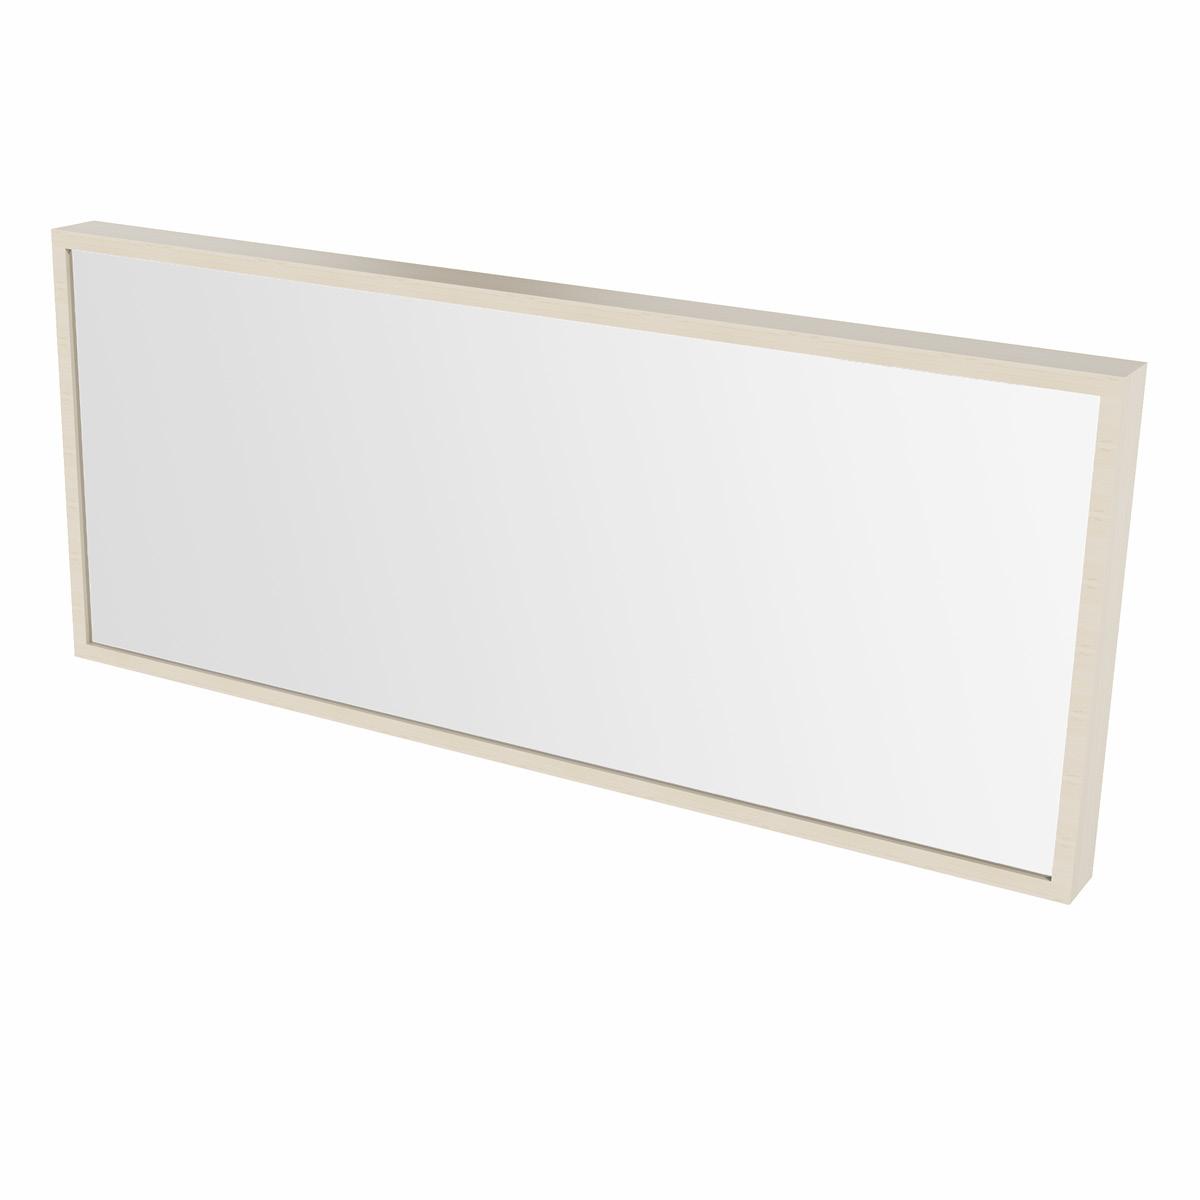 KZOAO Spiegel 120 cm breit C017